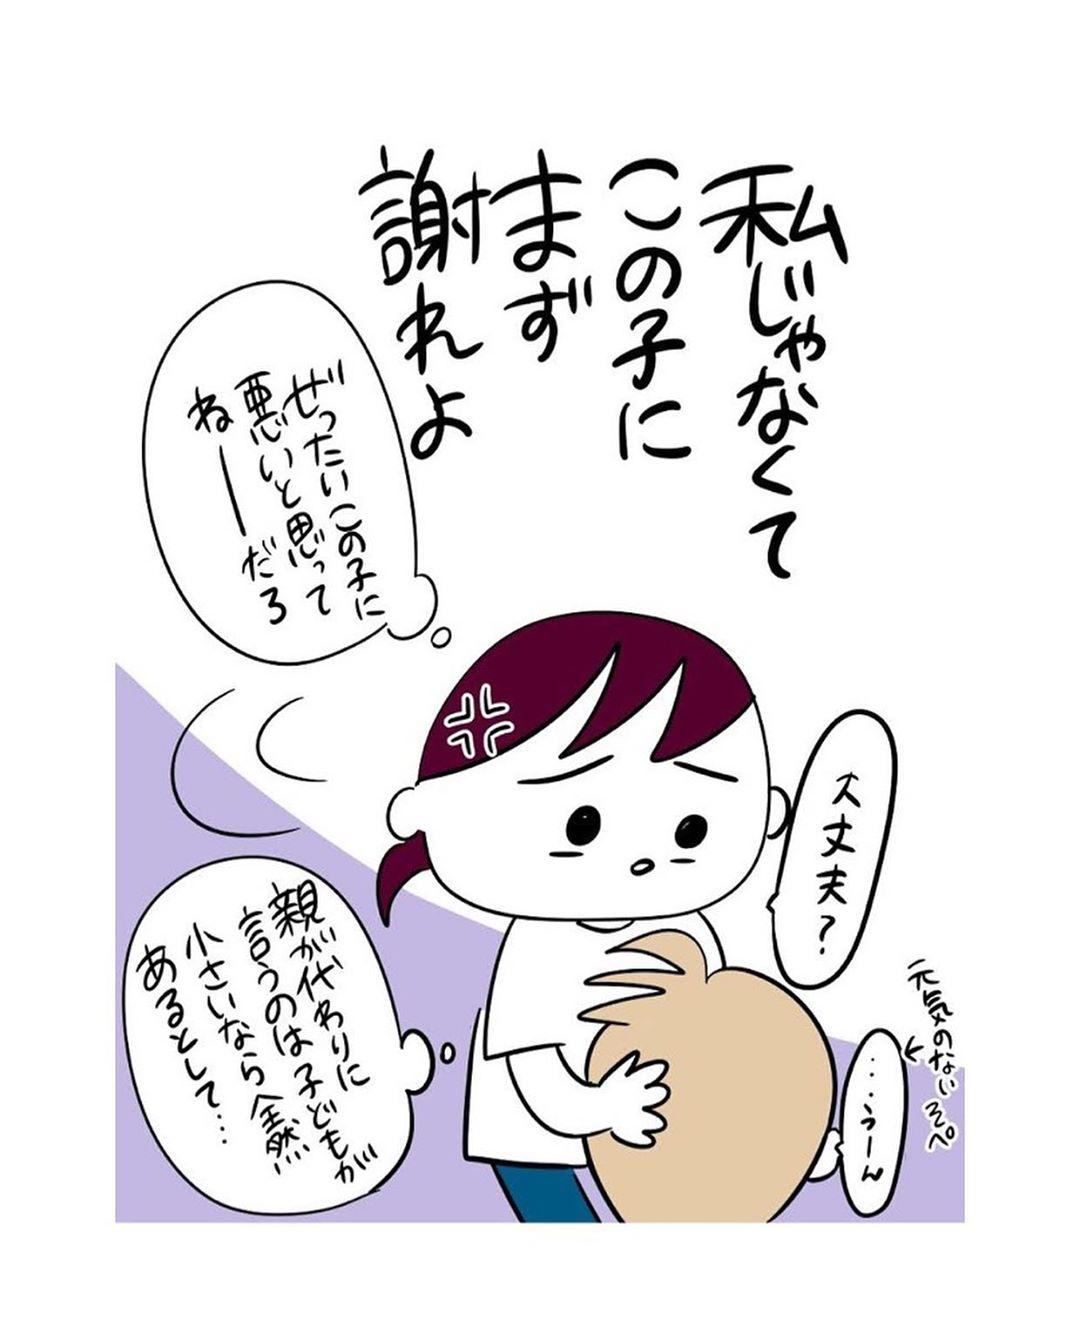 shirota.yunya_72851082_542904949588070_4562945826642474349_n